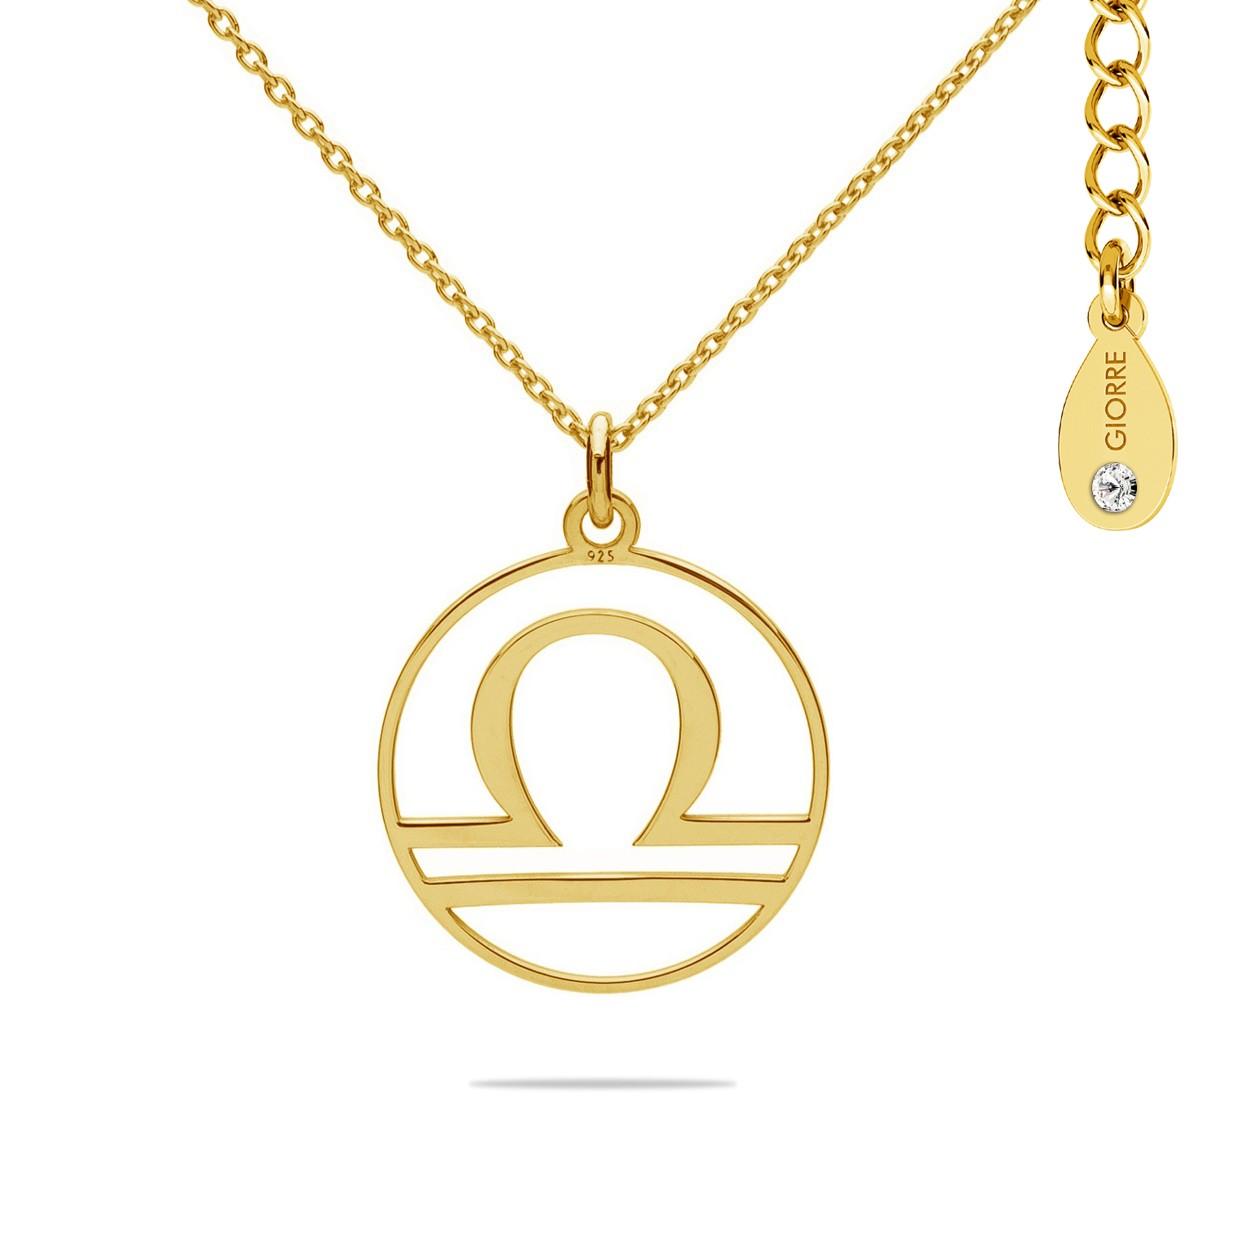 LIBRA zodiac sign necklace with Swarovski Crystals sterling silver 925